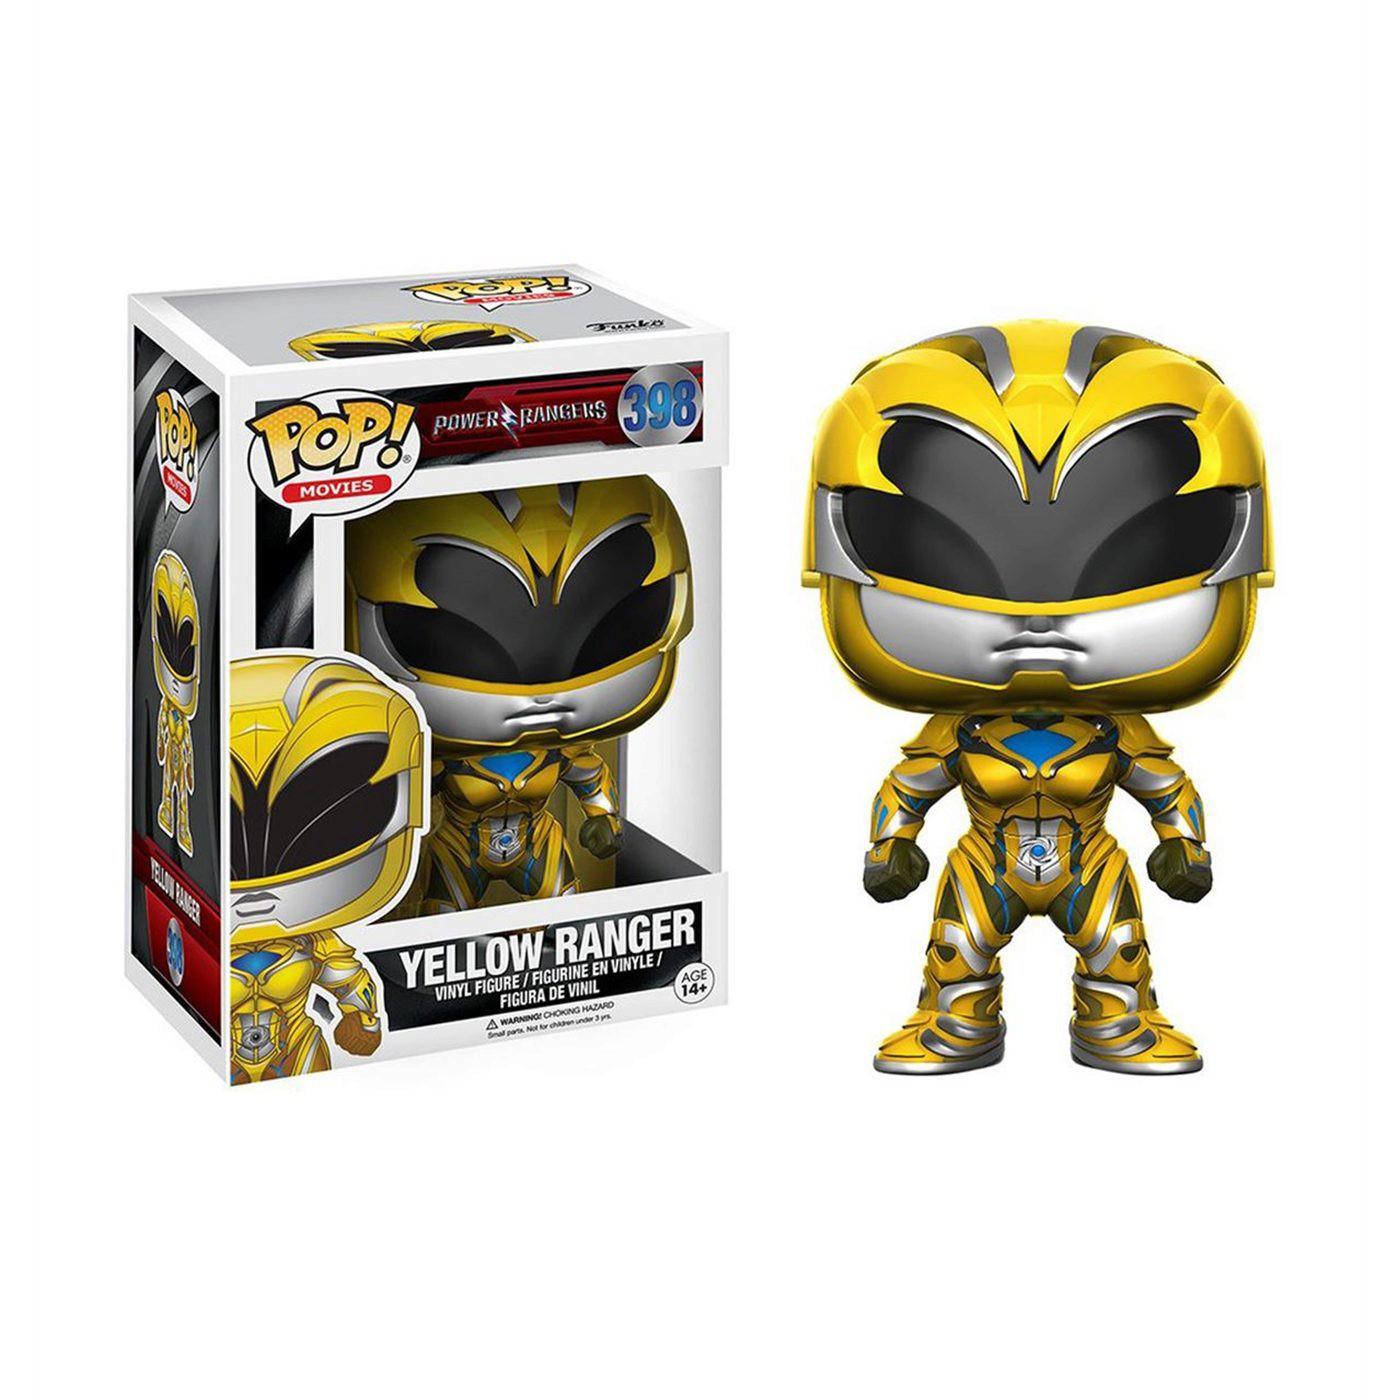 Power Rangers Movie Yellow Ranger Pop Vinyl Figure